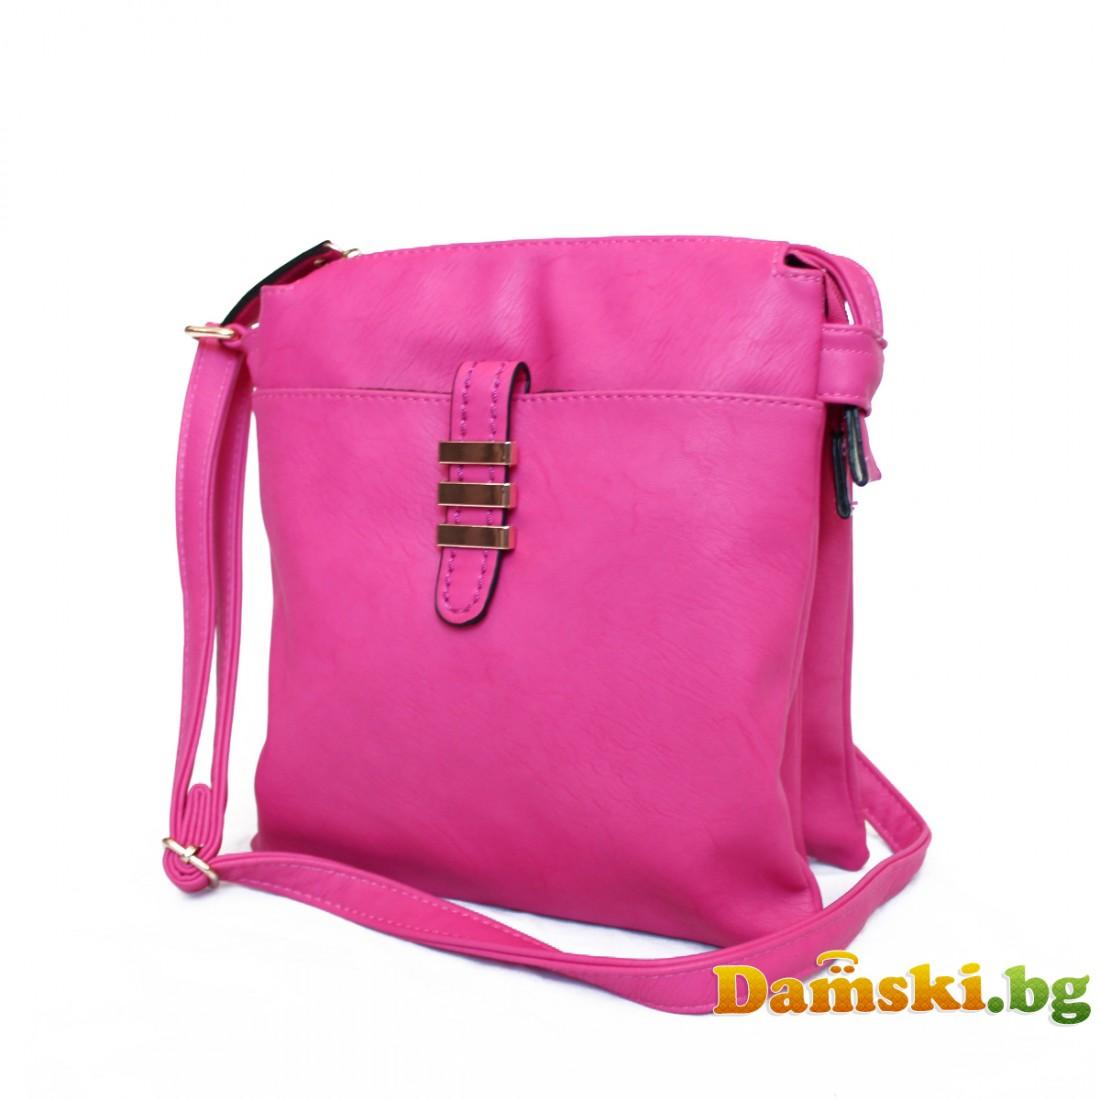 Дамска чанта през рамо - цикламена